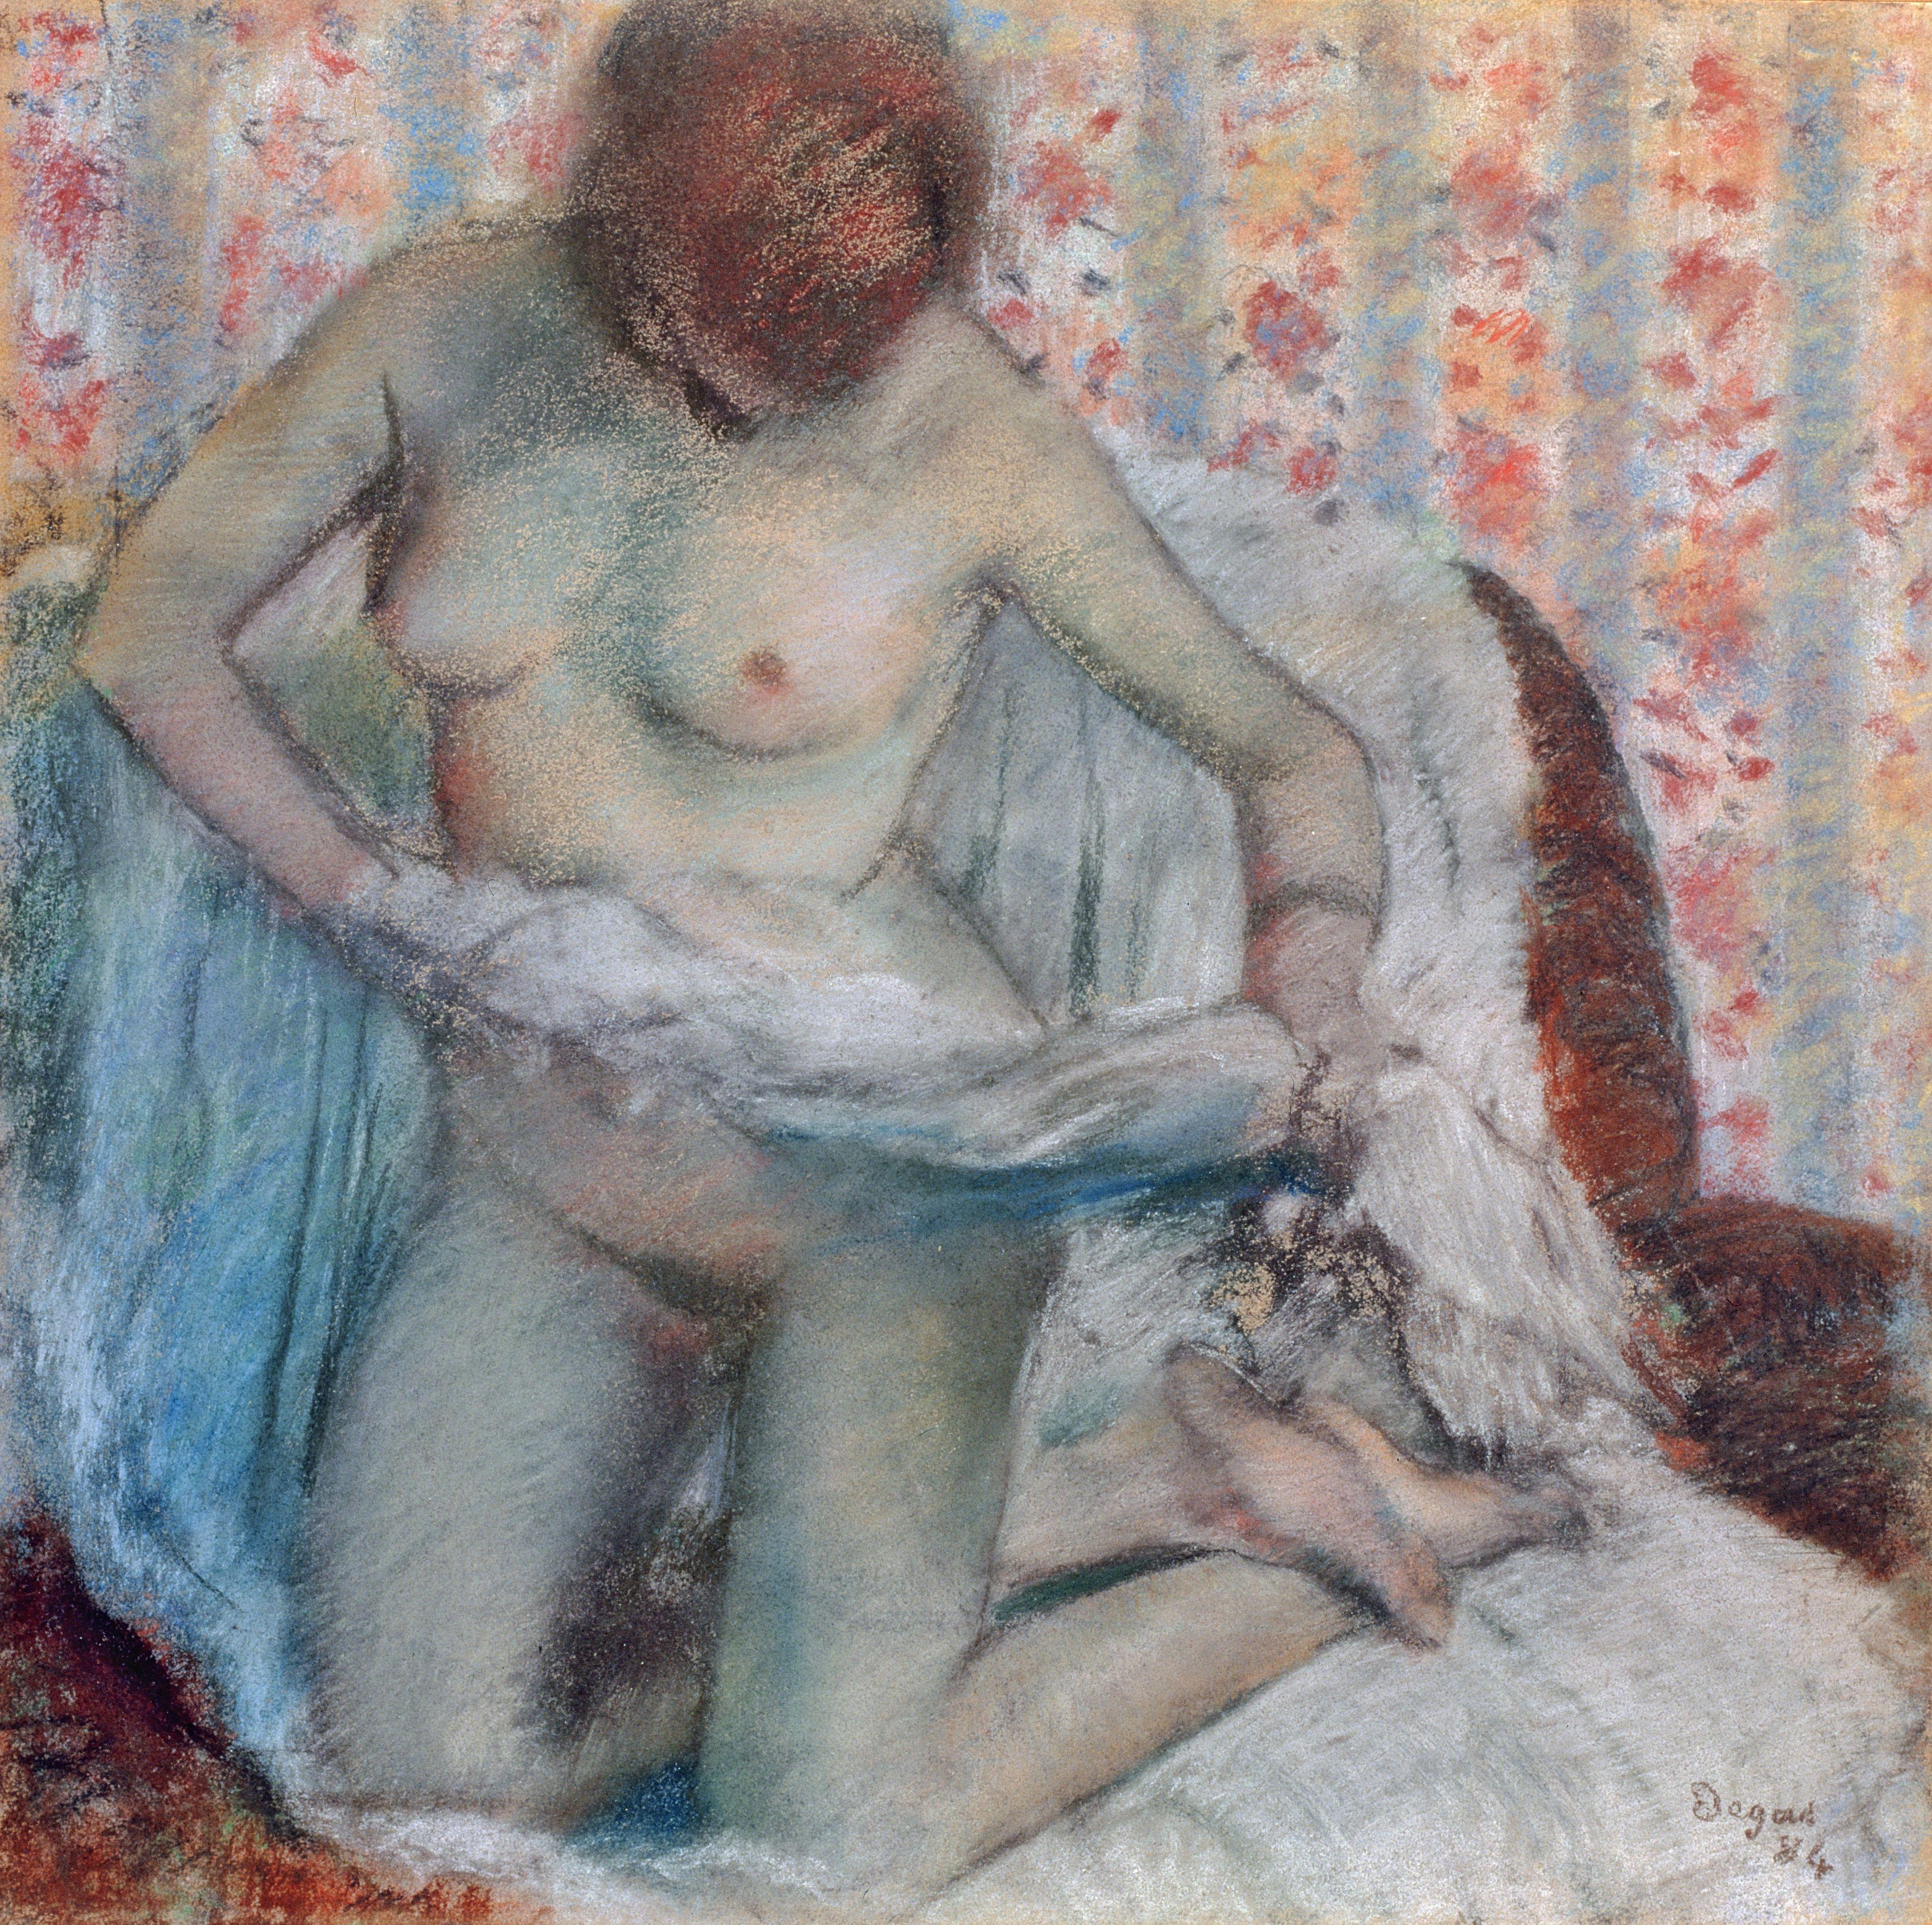 Edgar Degas, 1834-1917. Женщина за туалетом. 1895. 50 х 50 см. Санкт-Петербург, Эрмитаж